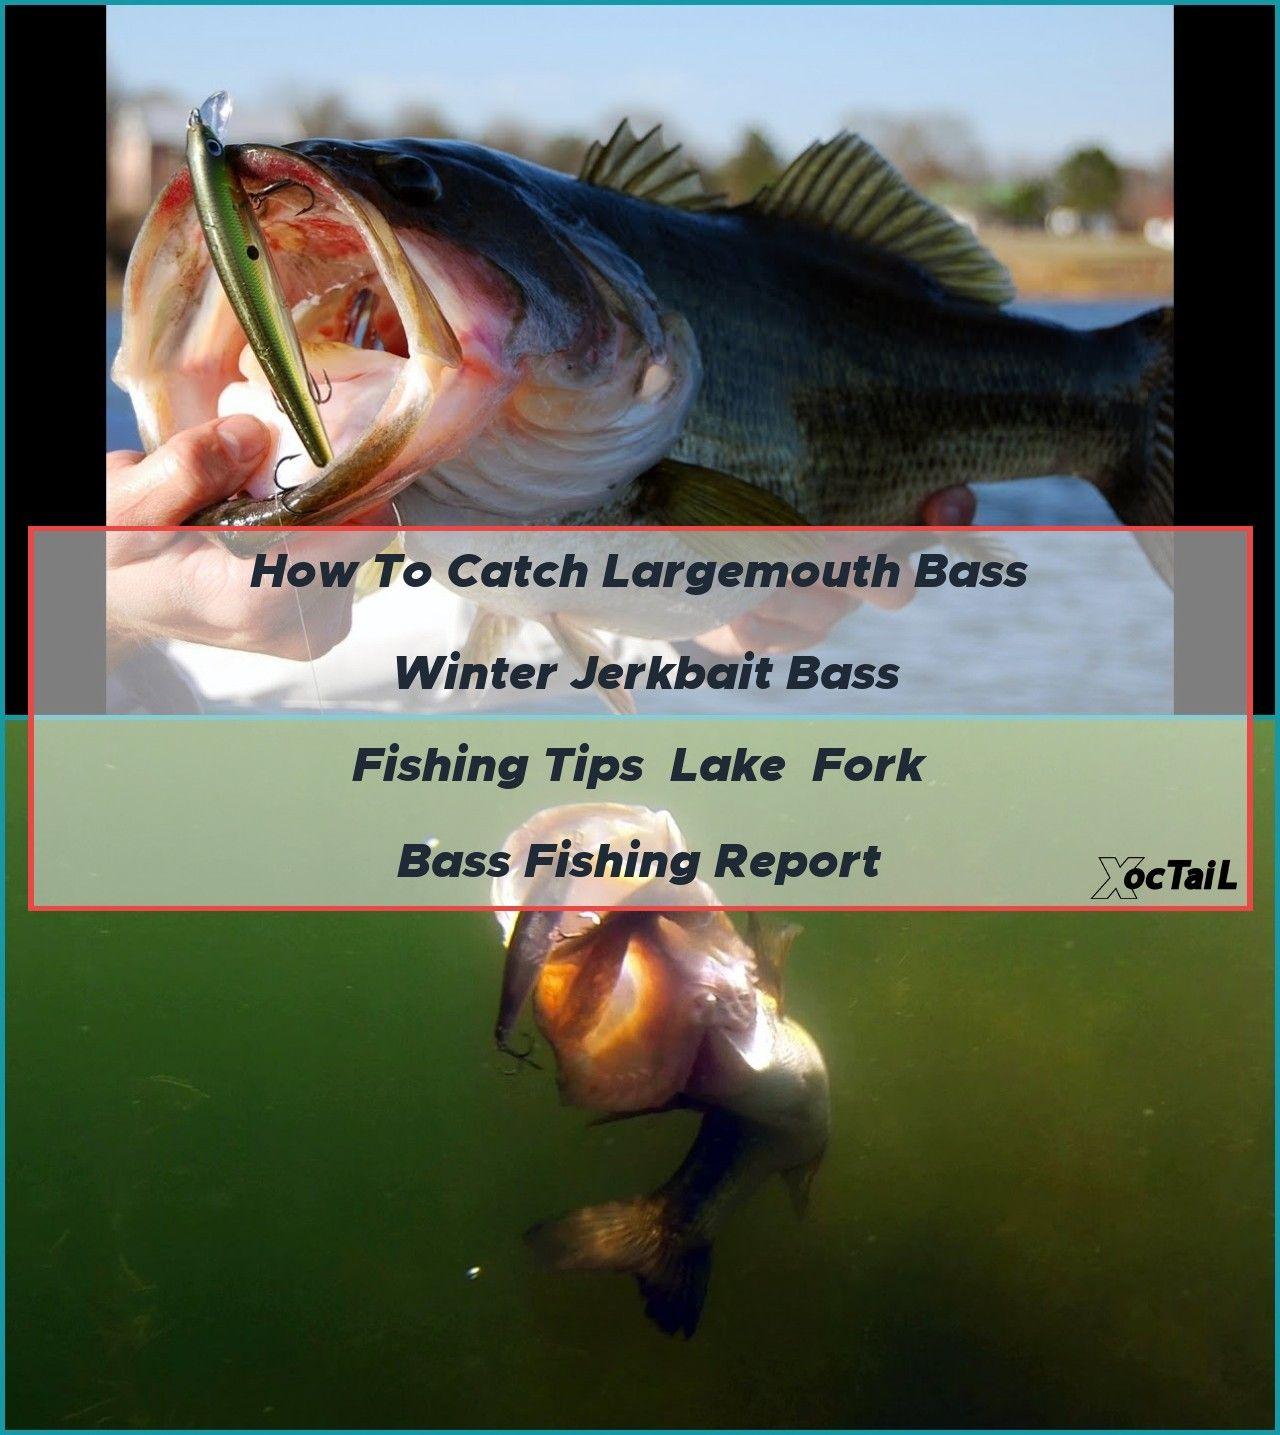 How to Catch Largemouth Bass Winter Jerkbait Bass Fishing